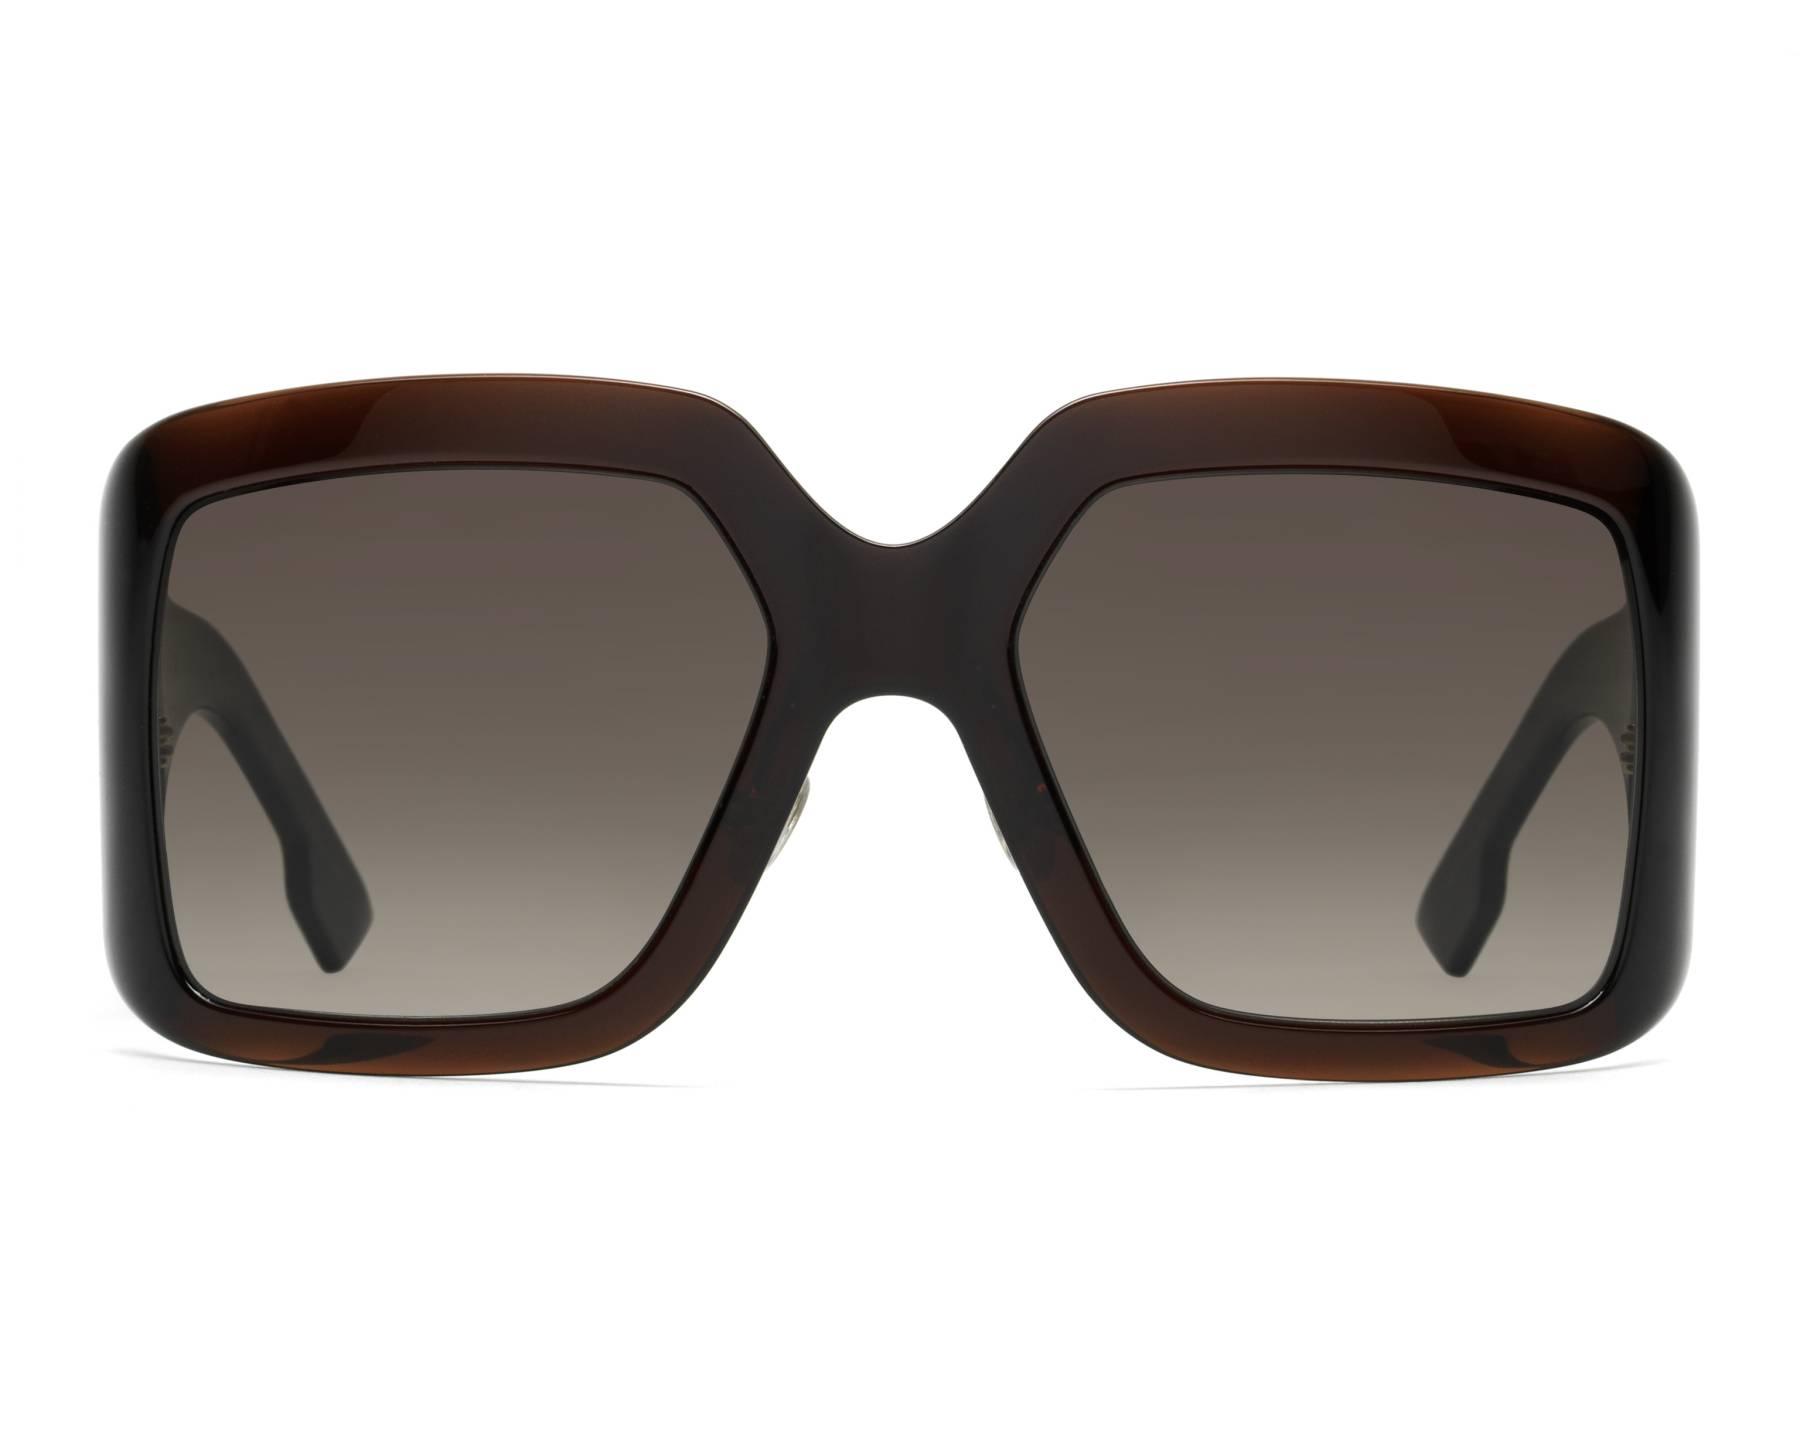 Dior Sight O2 women Eyeglasses online sale